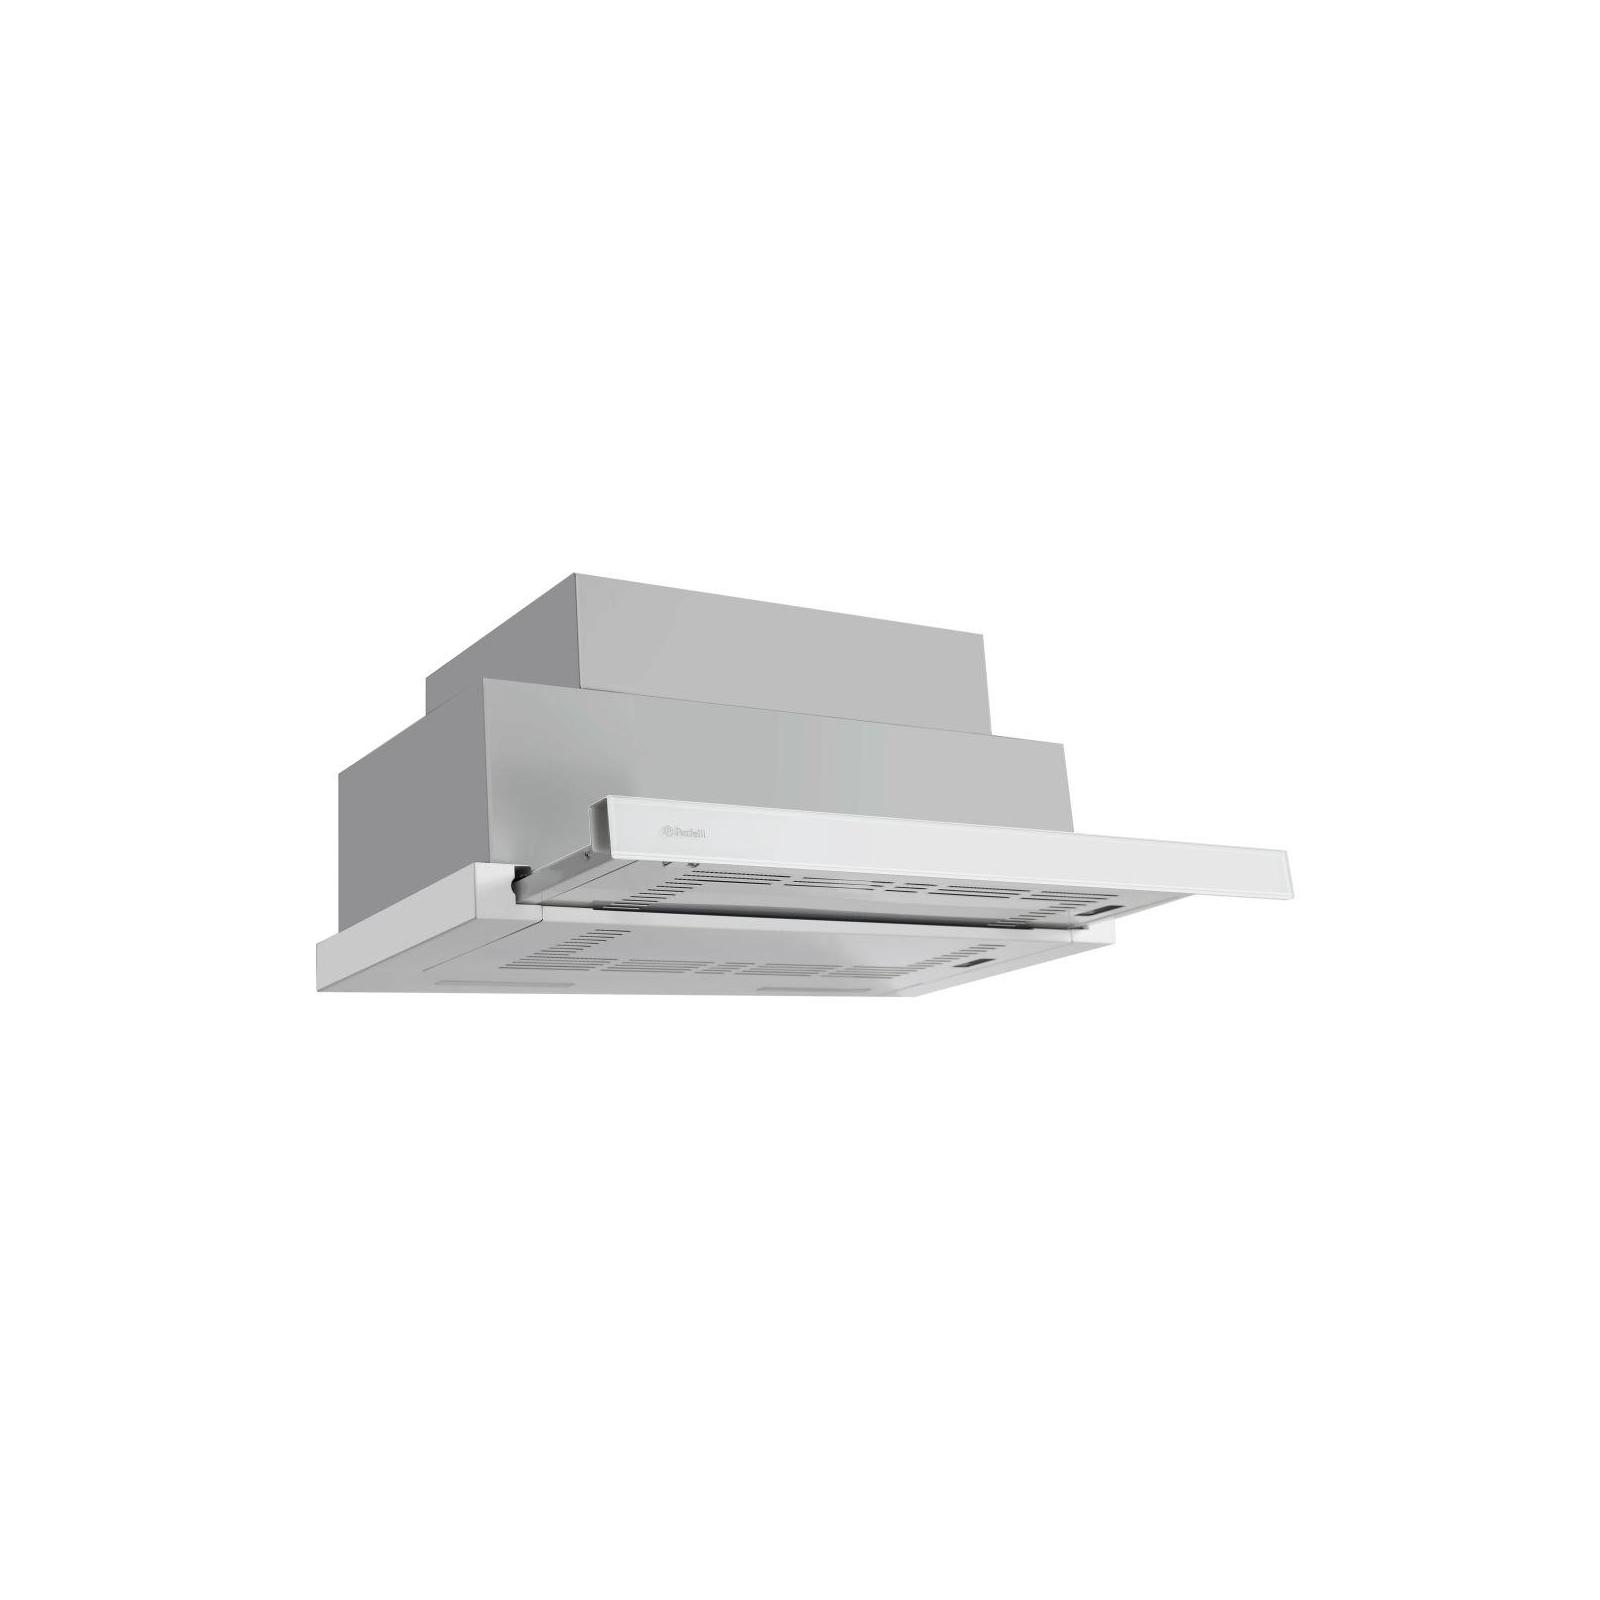 Вытяжка кухонная PERFELLI TLS 6833 W LED Strip изображение 4